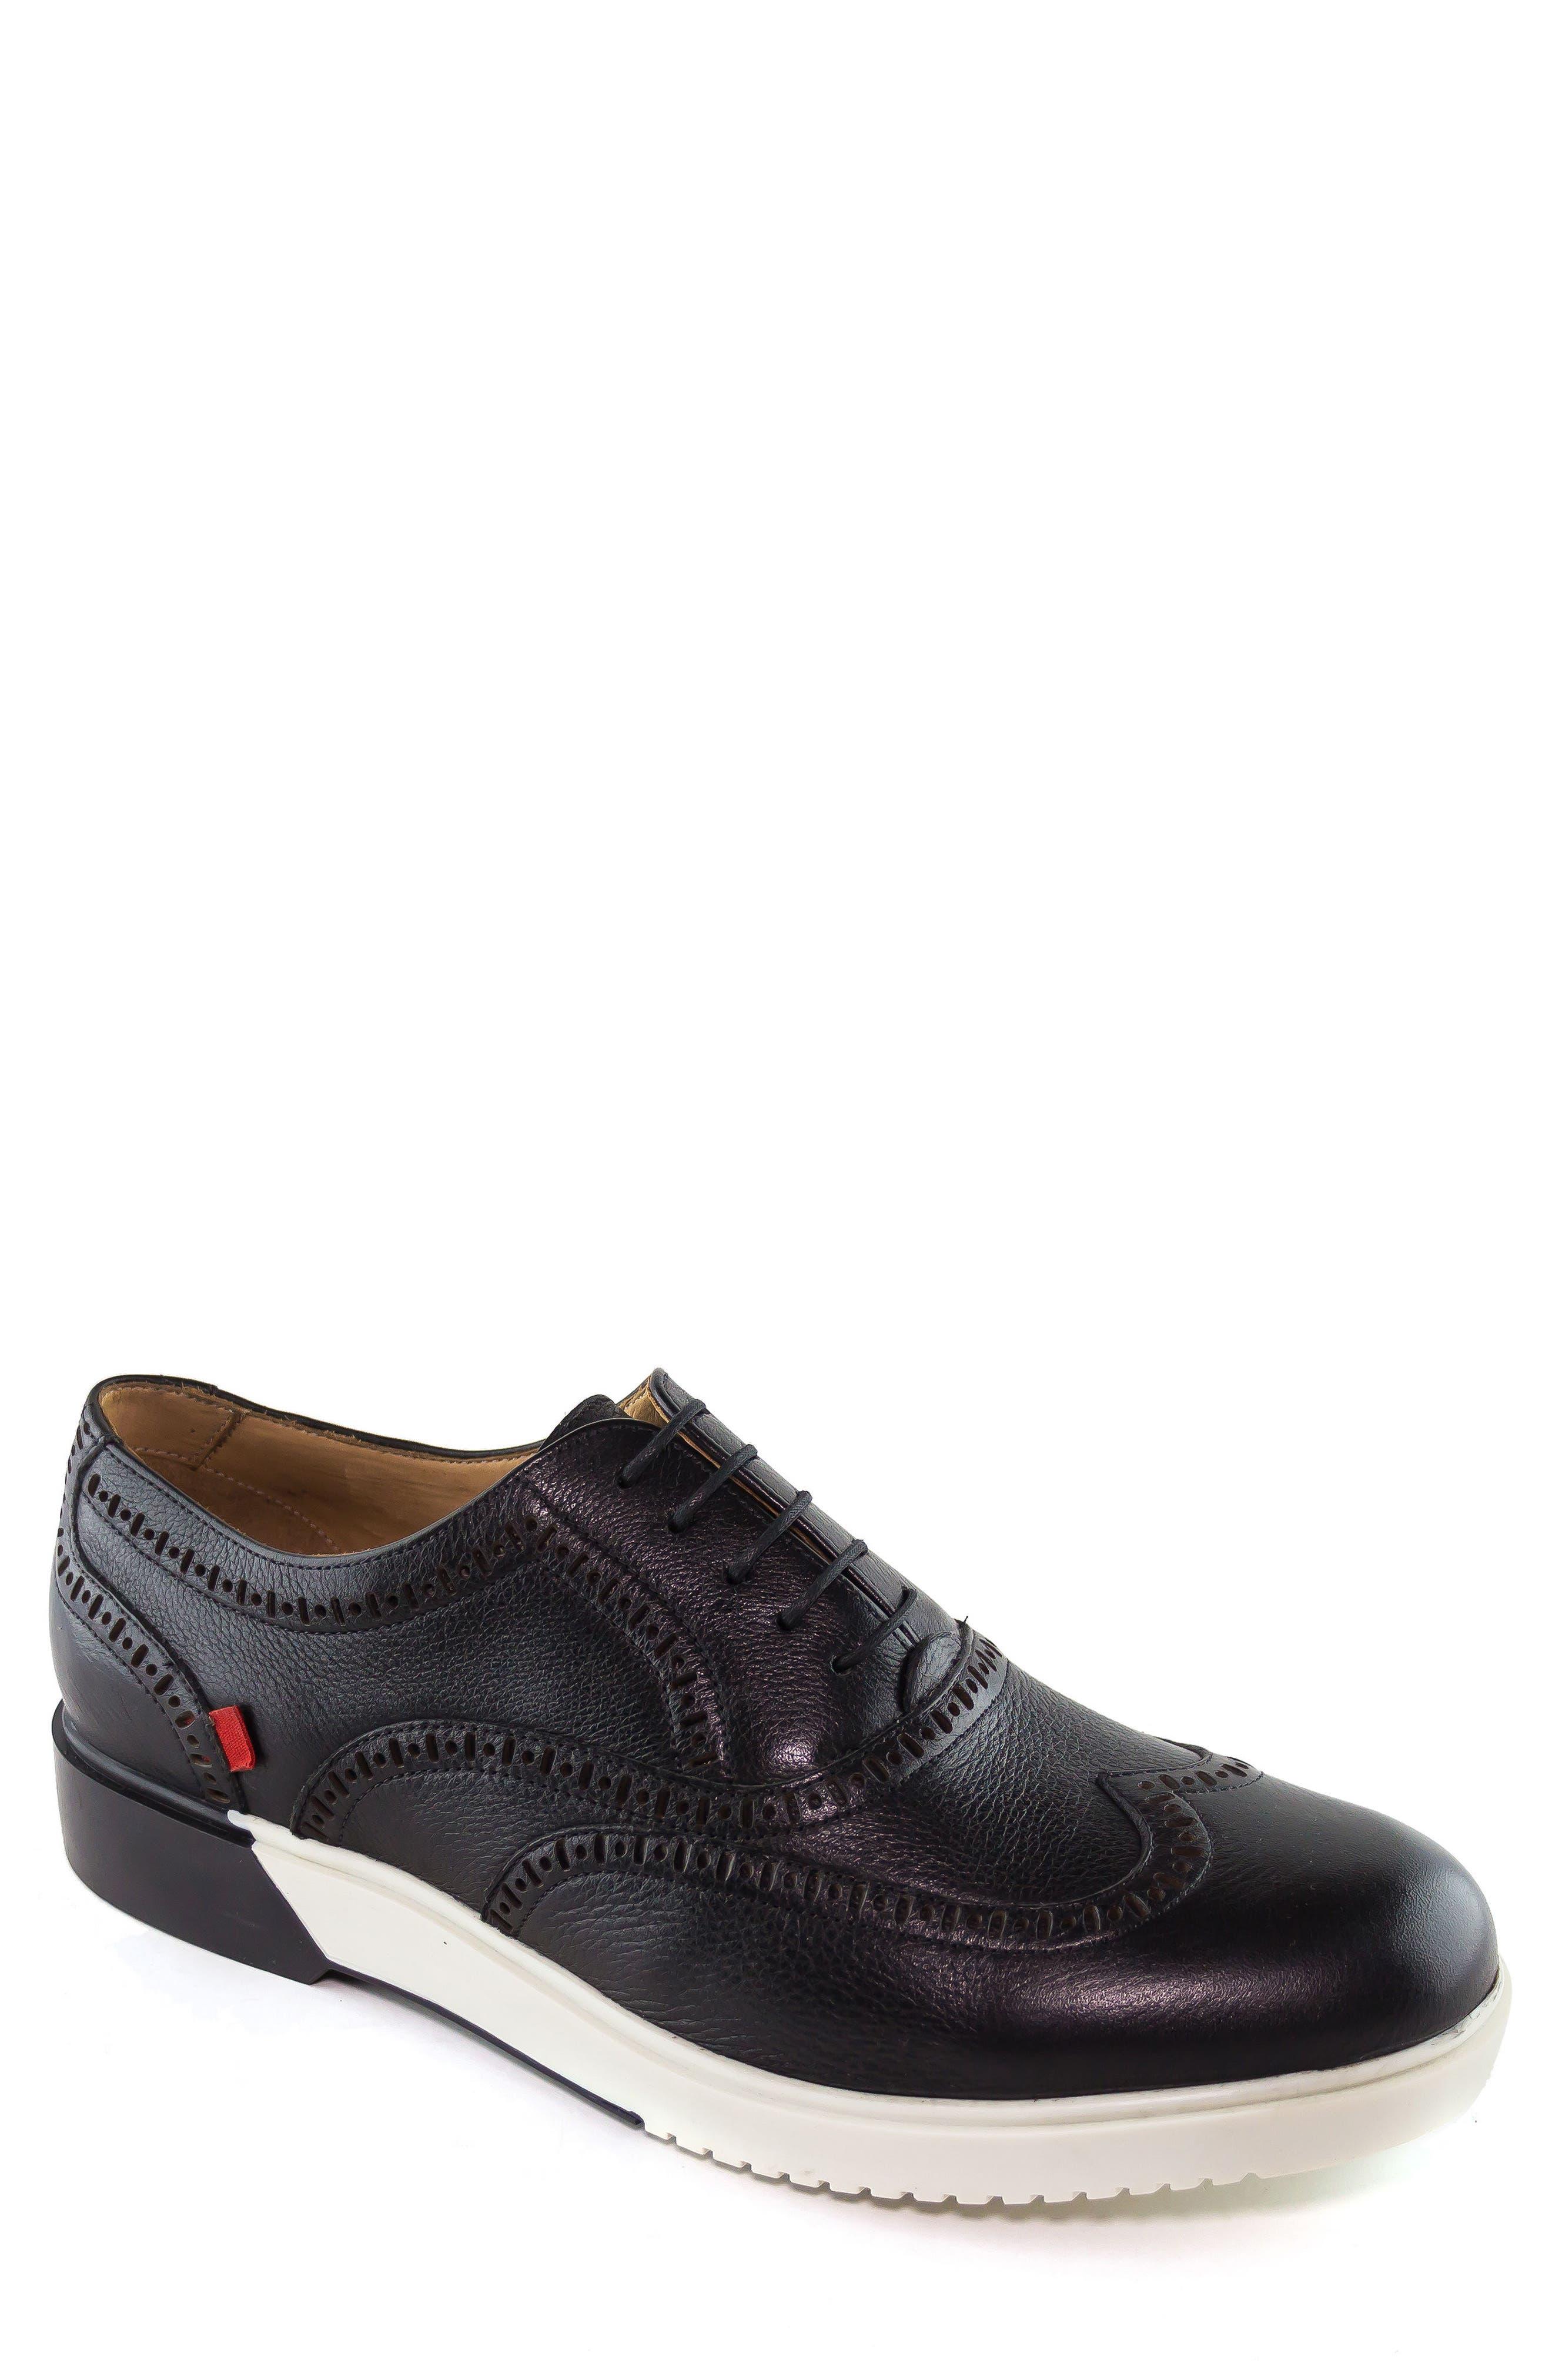 MARC JOSEPH NEW YORK, 5th Ave Wingtip Sneaker, Main thumbnail 1, color, 001